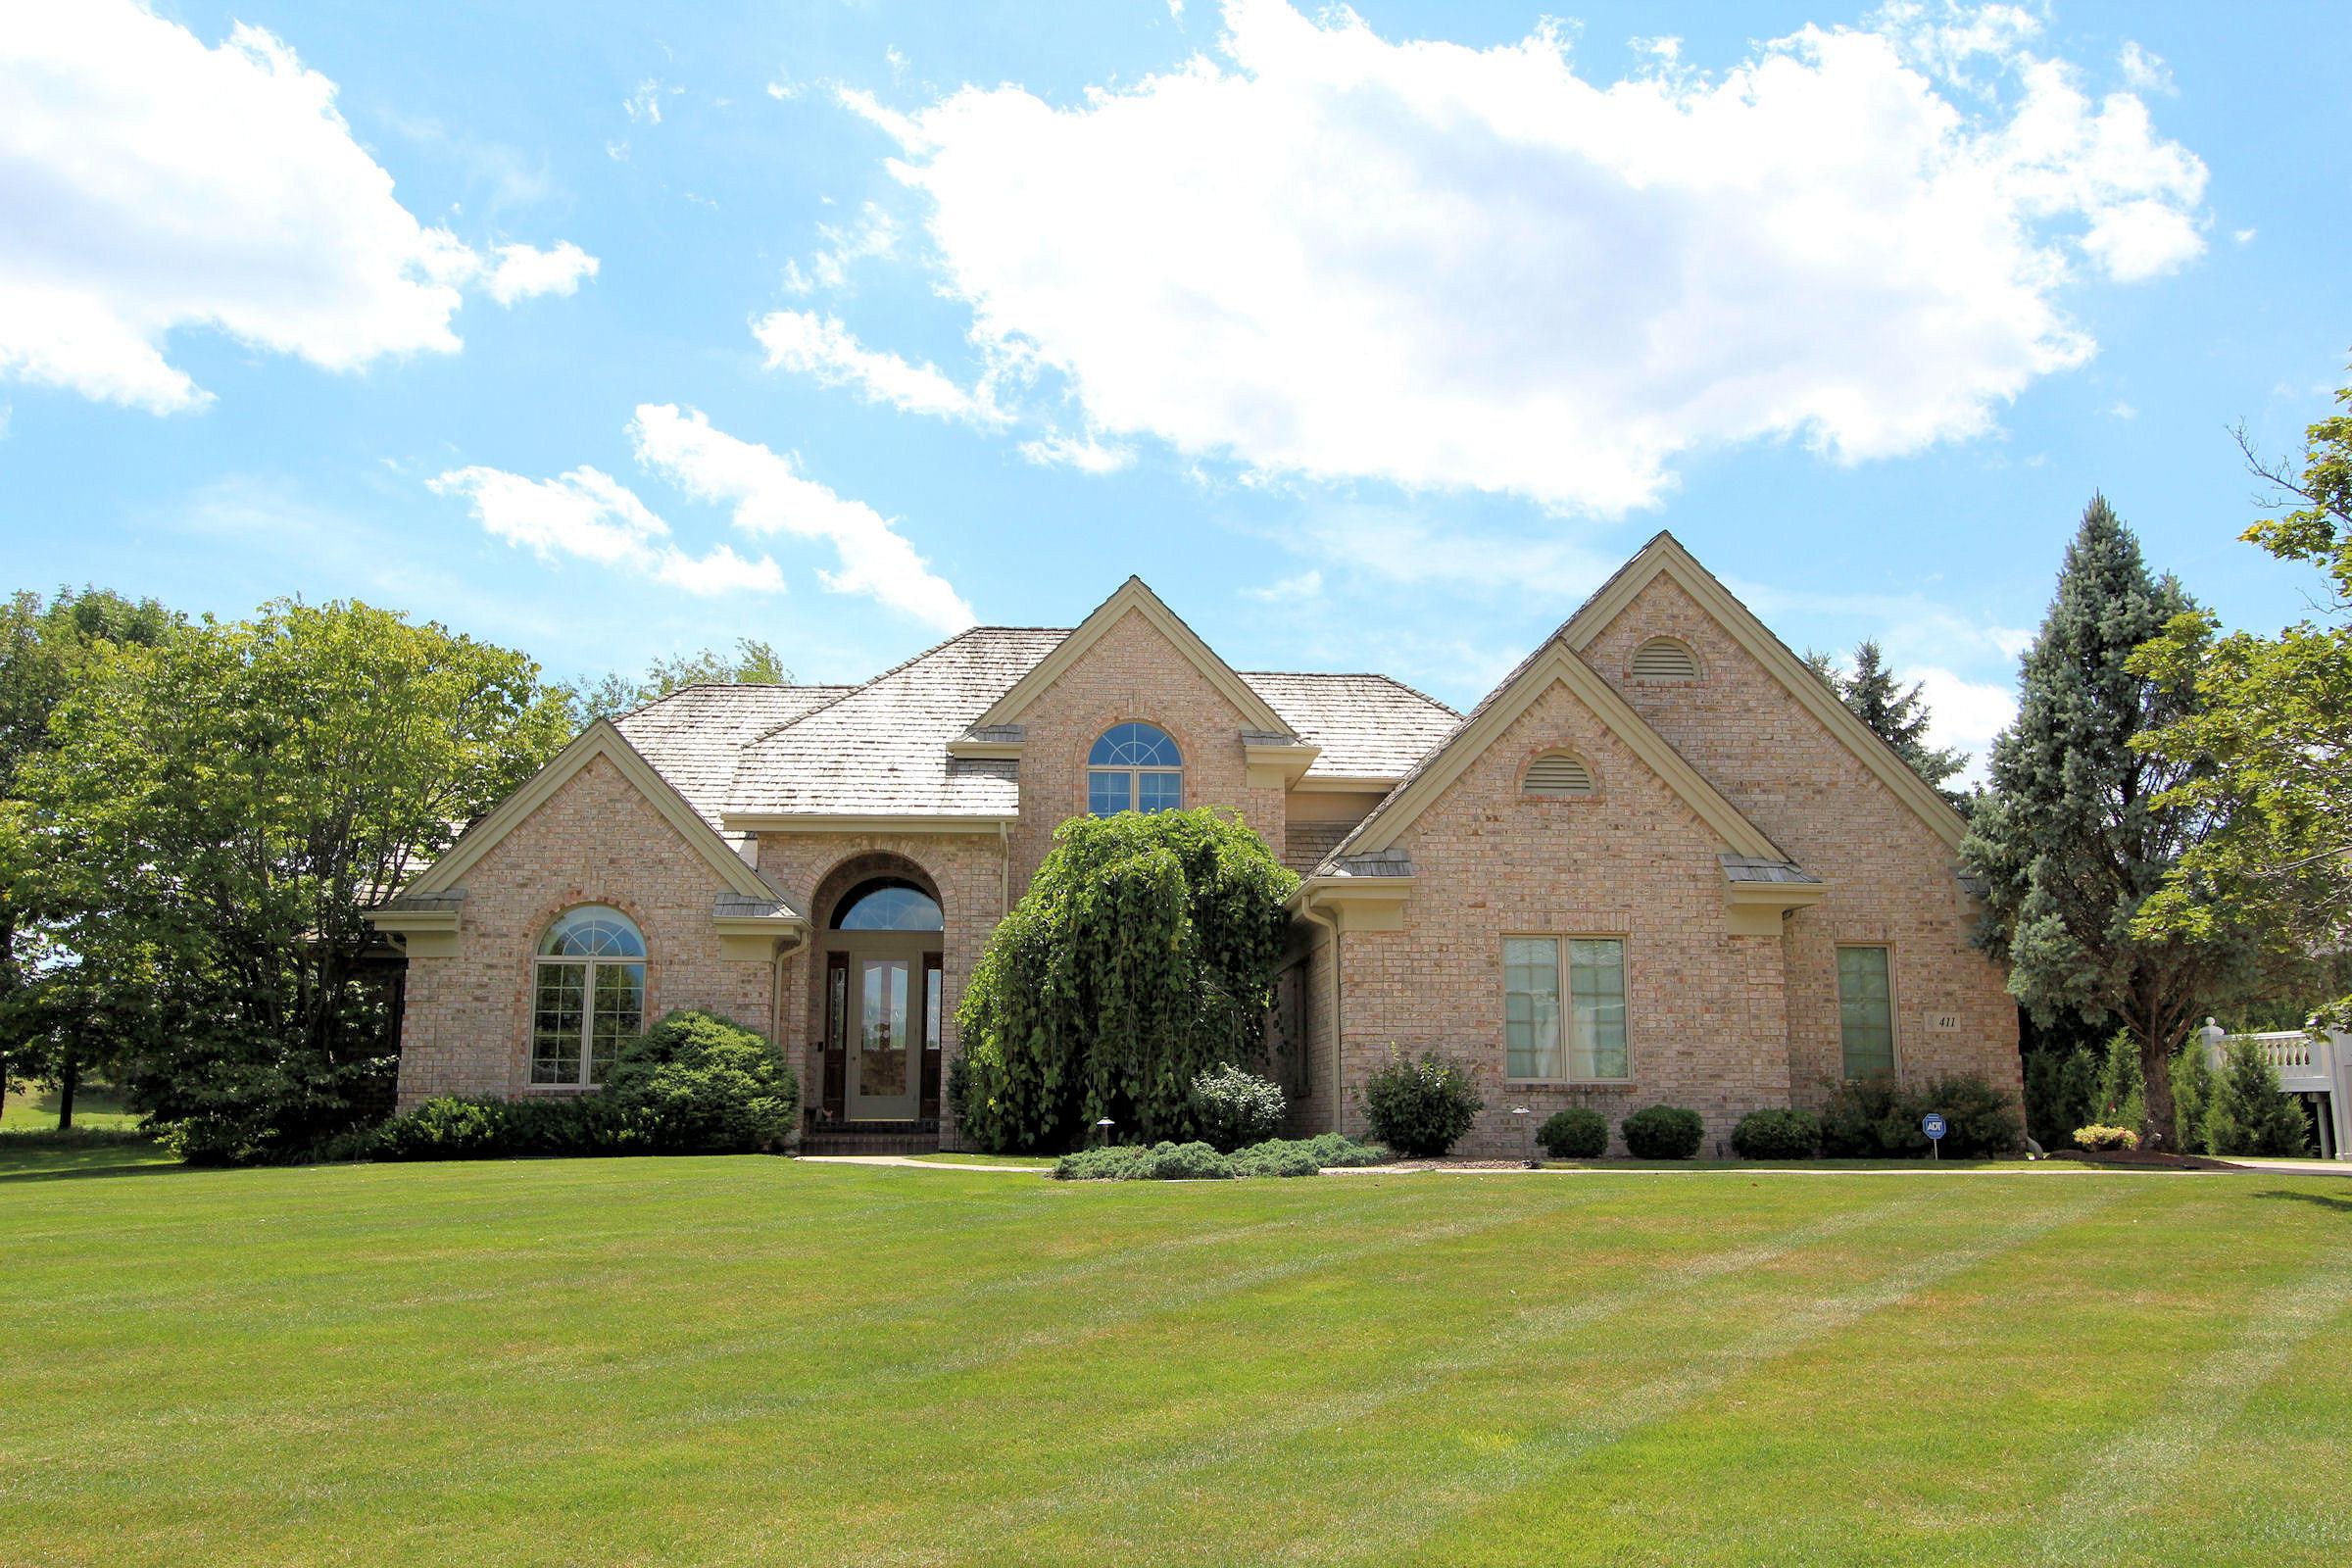 411 Thornbush Cir, Hartland, Wisconsin 53029, 4 Bedrooms Bedrooms, 11 Rooms Rooms,4 BathroomsBathrooms,Single-Family,For Sale,Thornbush Cir,1695309